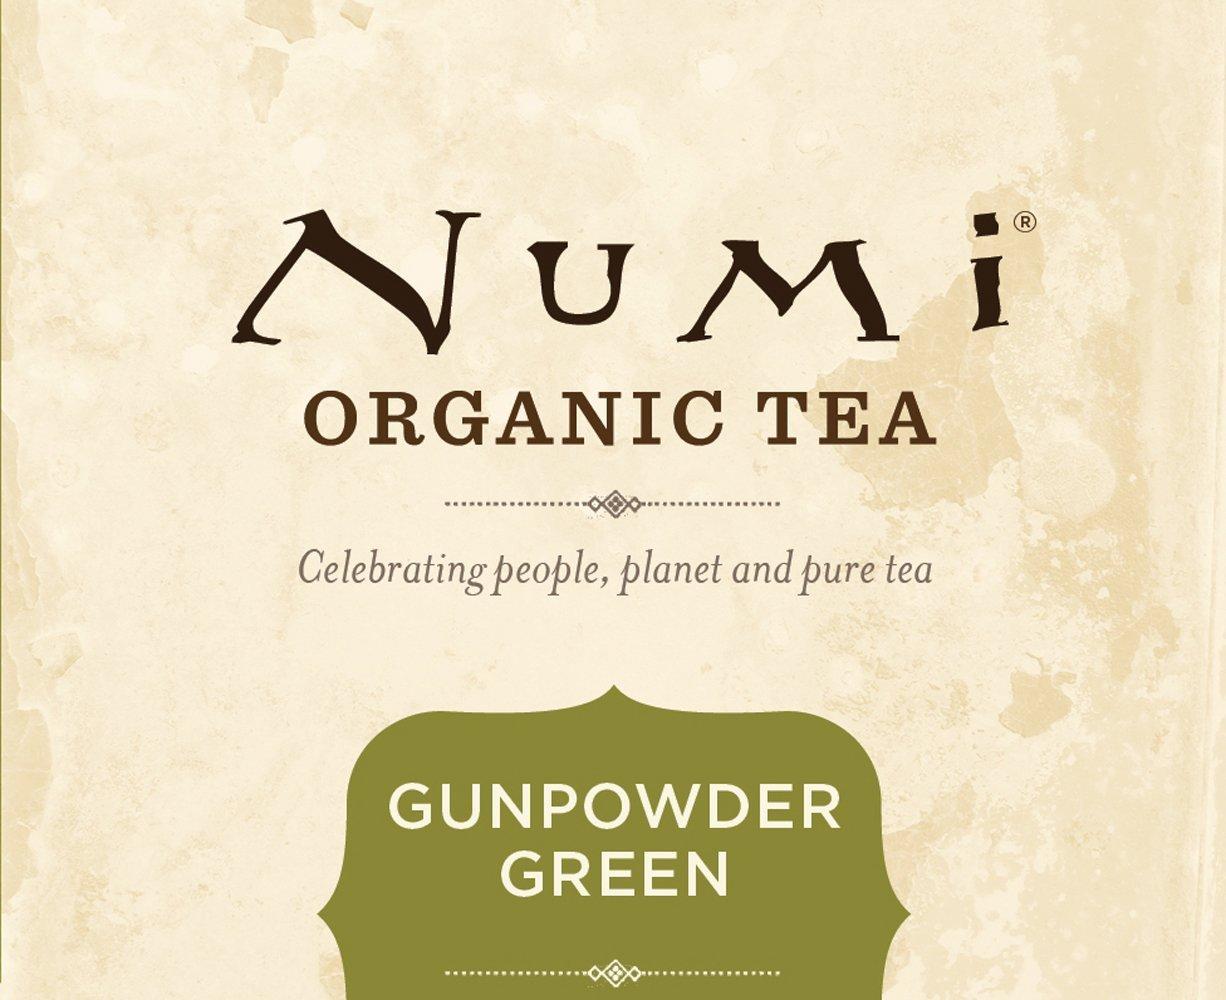 Numi 100% organic tea